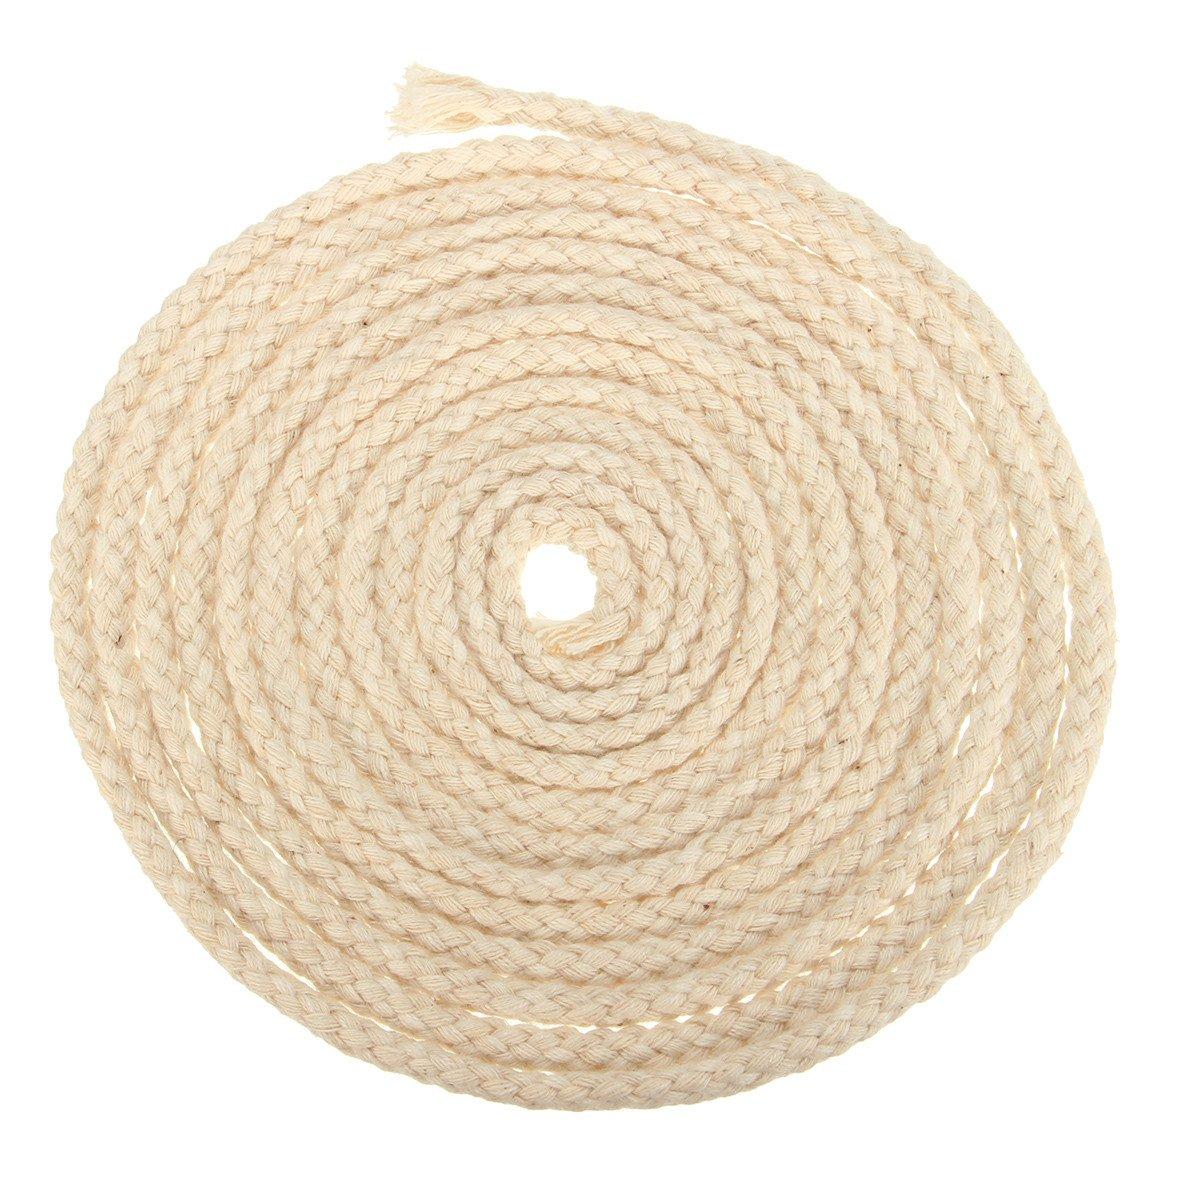 QOJA 3m long 3/16 inch diameter round cotton wicks burner for